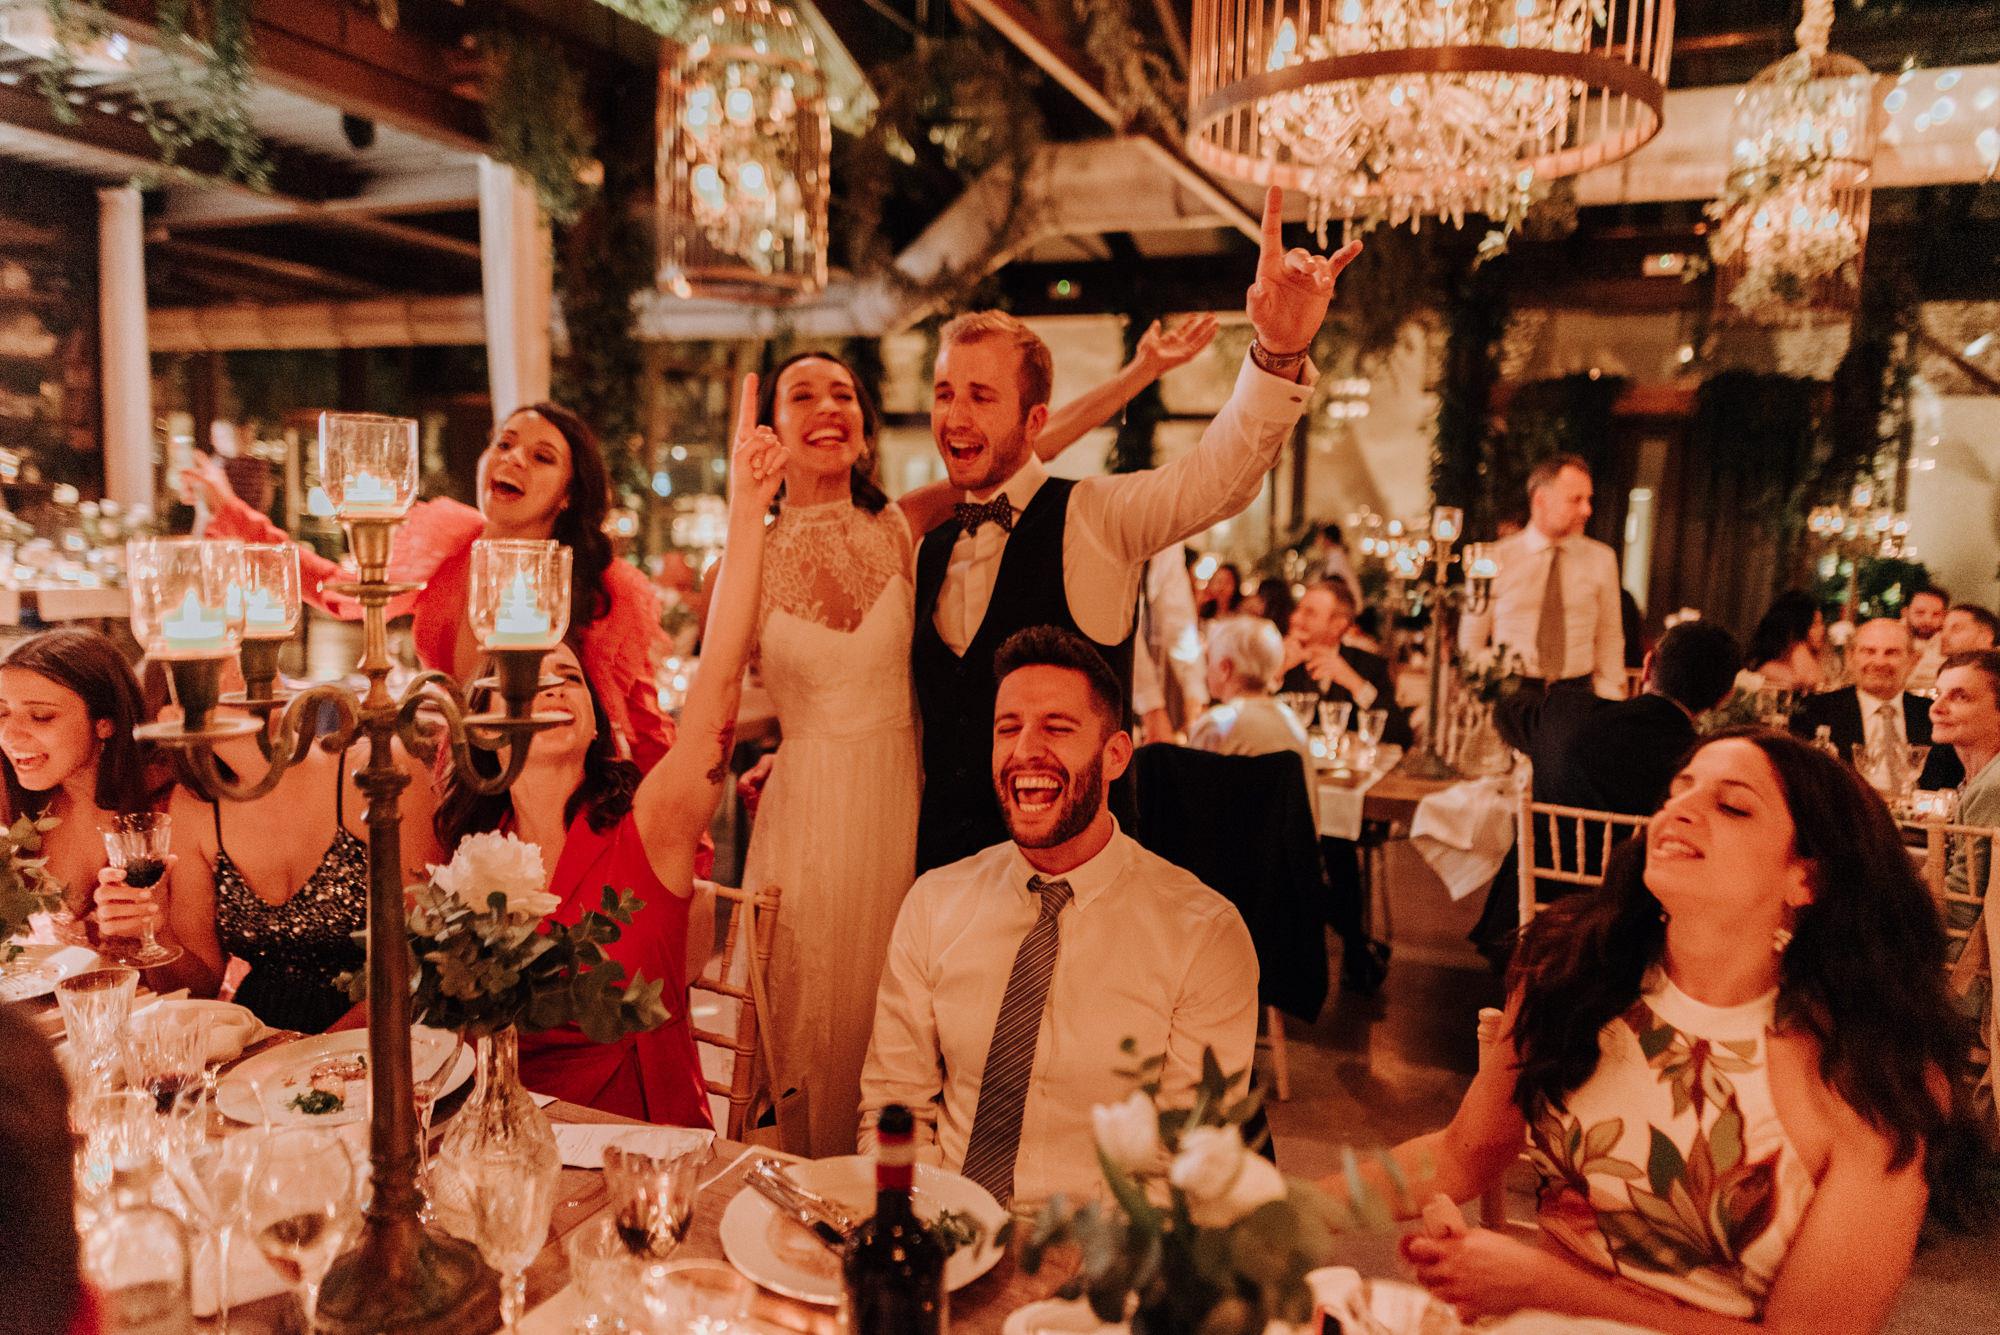 FOTO+PHOTO+BODA+WEDDING+ITALIA+ITALY+MAURICIO+GARAY+MAURICIOGARAY+WEDDINPHOTOGRAPHER+FOTOGRAFODEBODA-1794.jpg